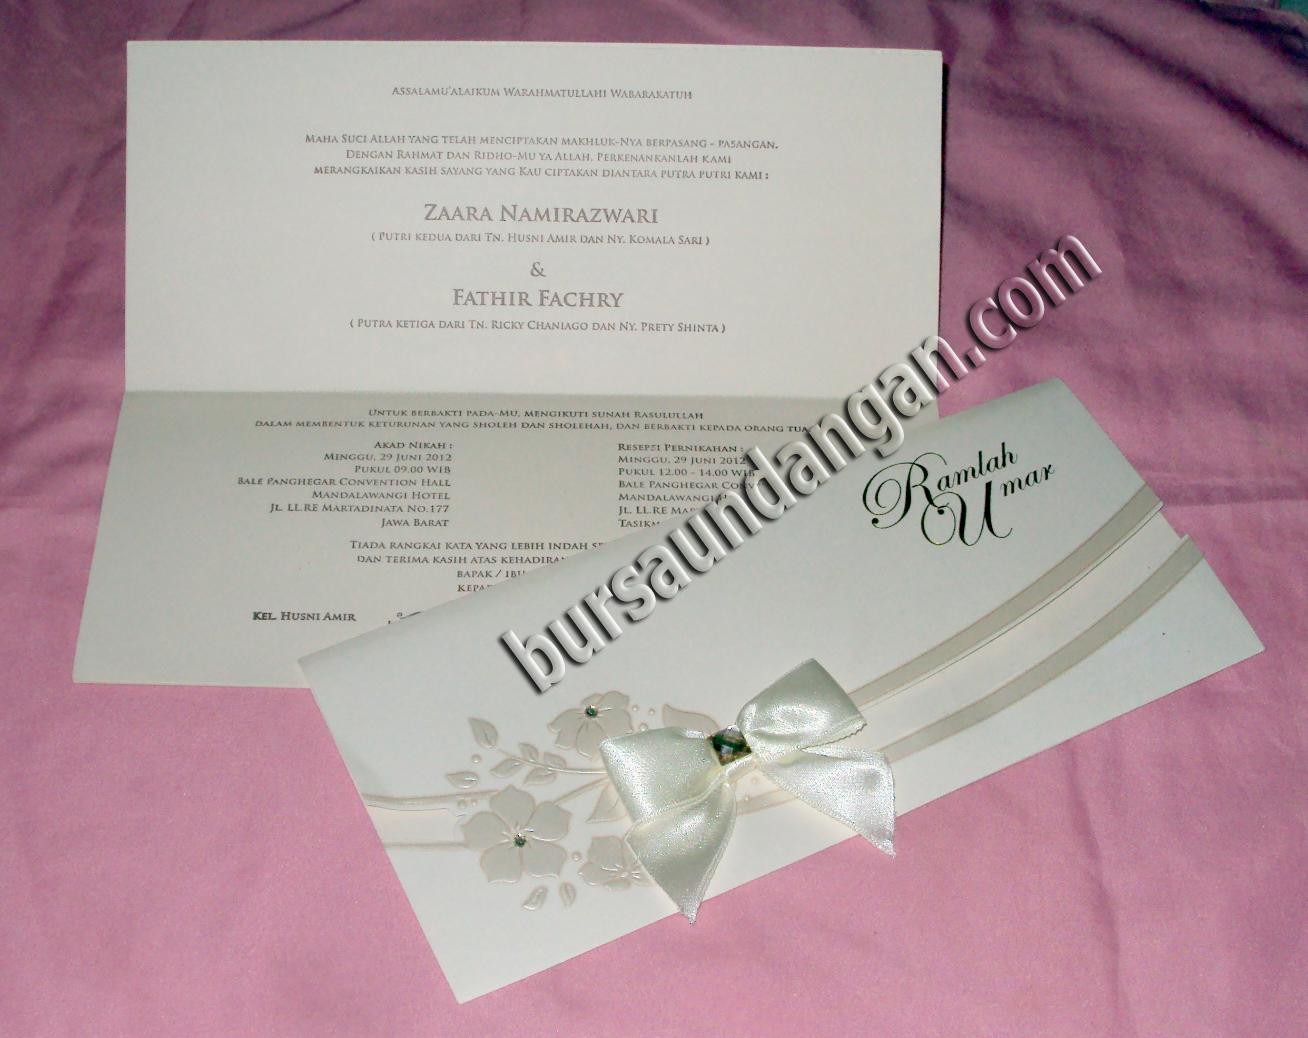 undangan pernikahan unik kata genuardis portal undangan pernikahan ...